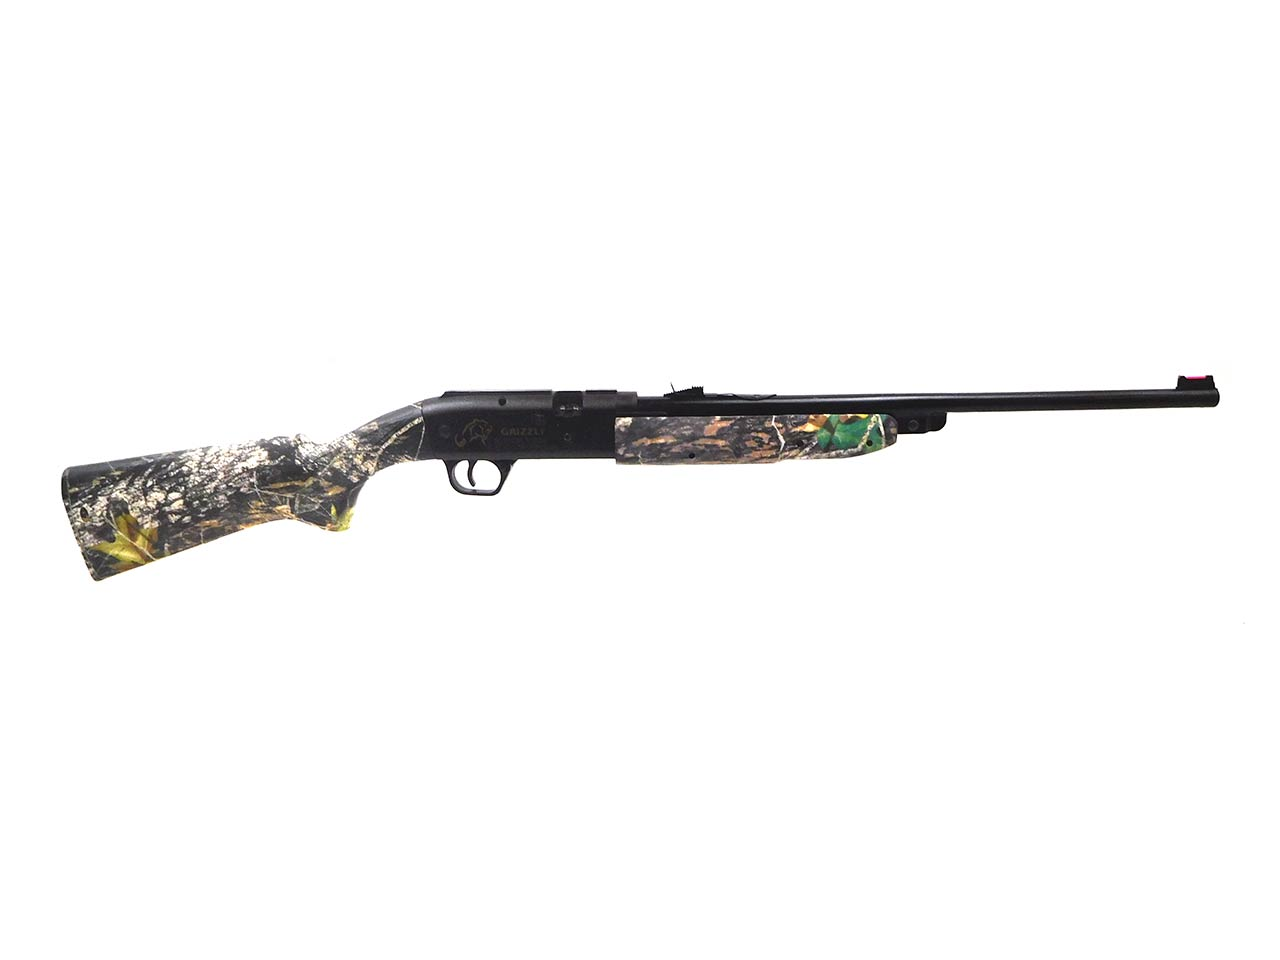 Daisy Grizzly 840 Air Rifle